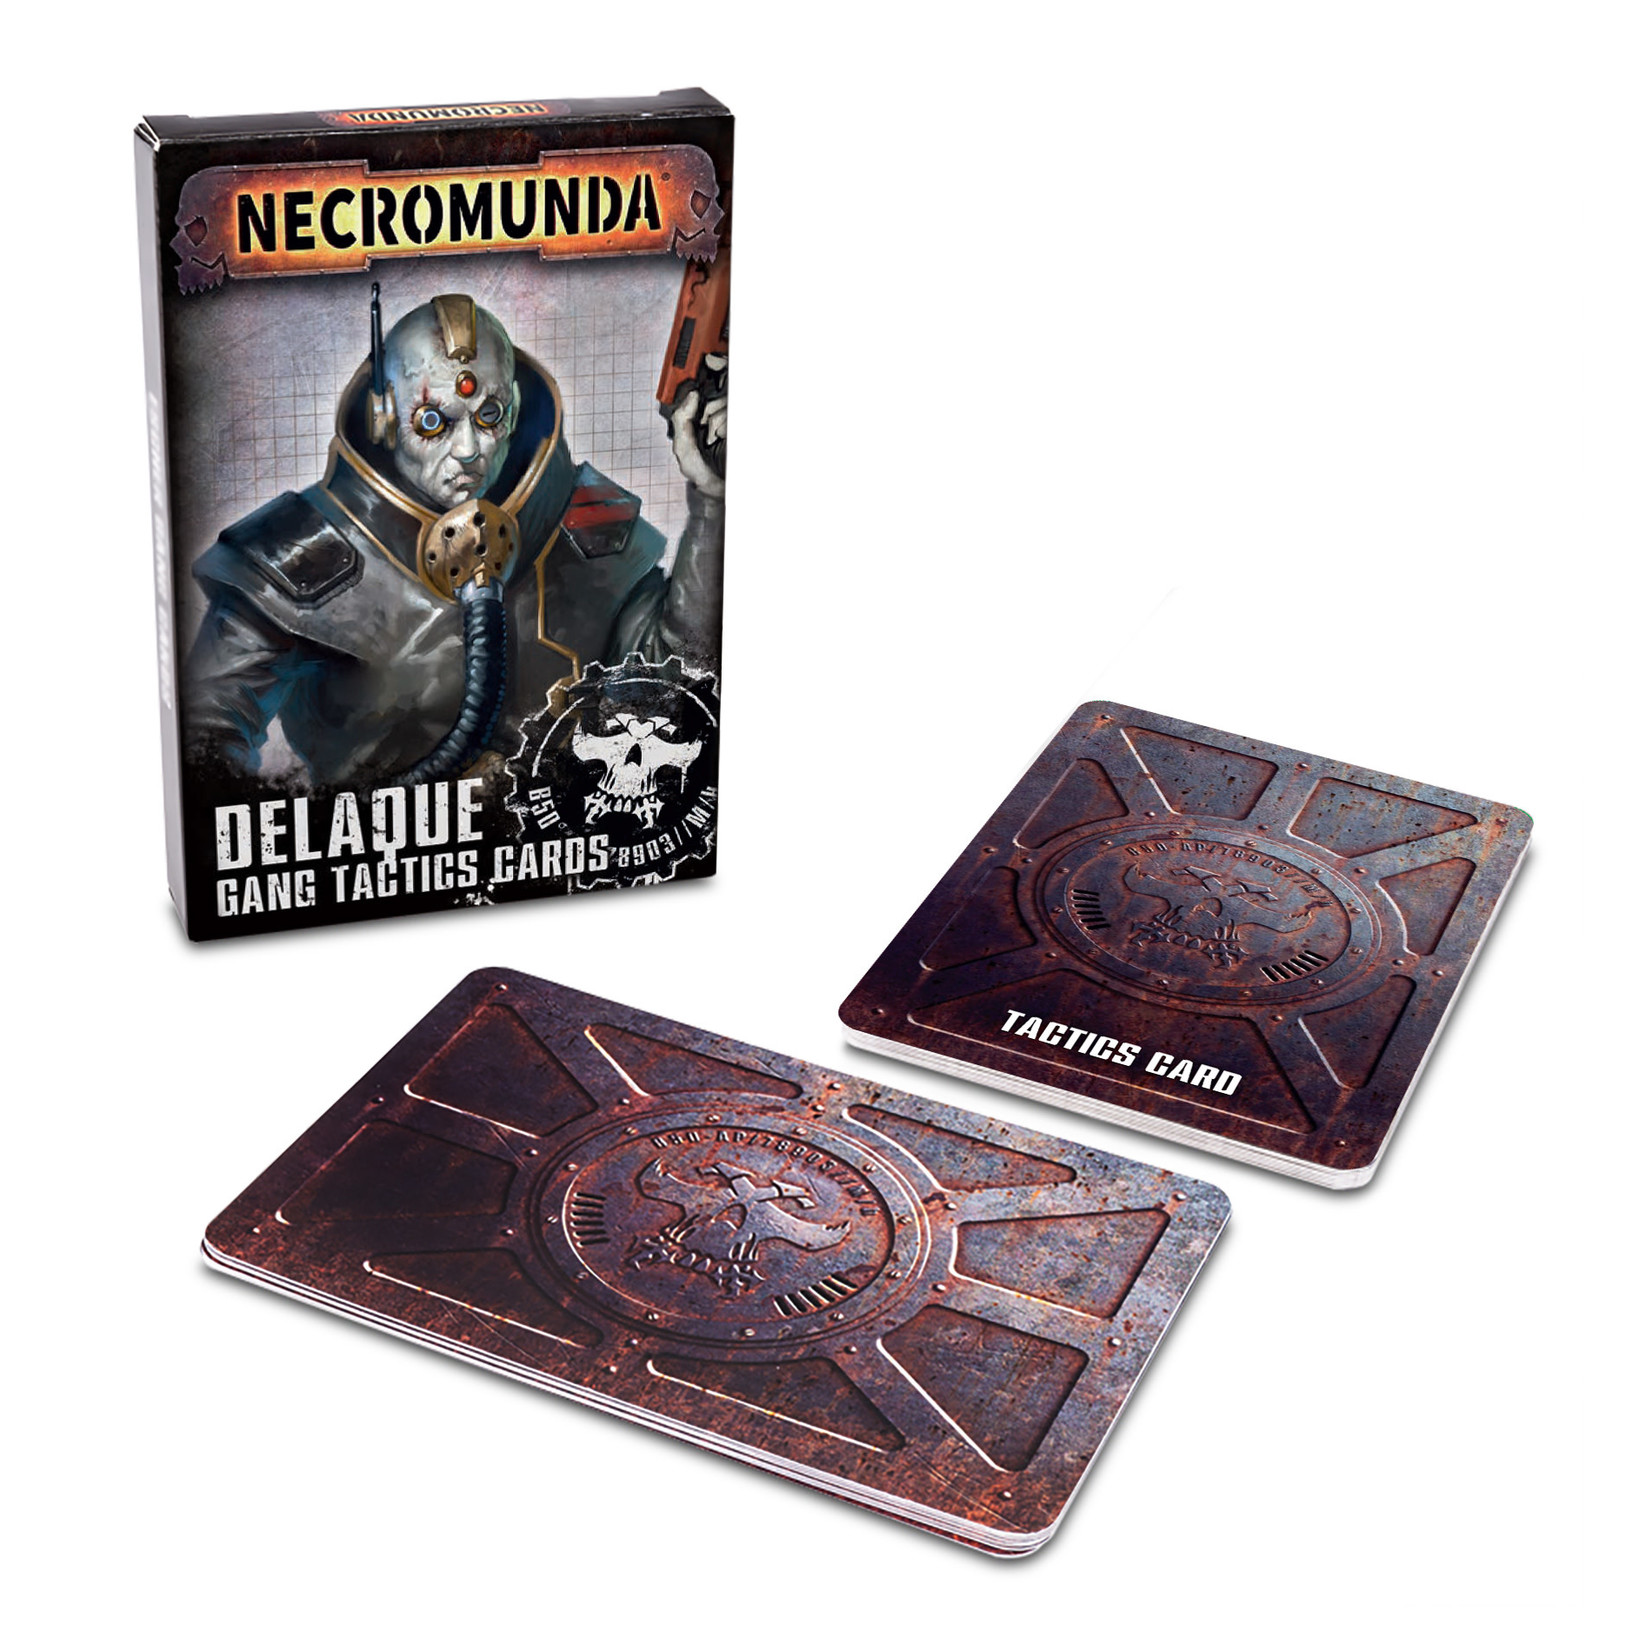 Necromunda Delaque Gang Tatics Cards